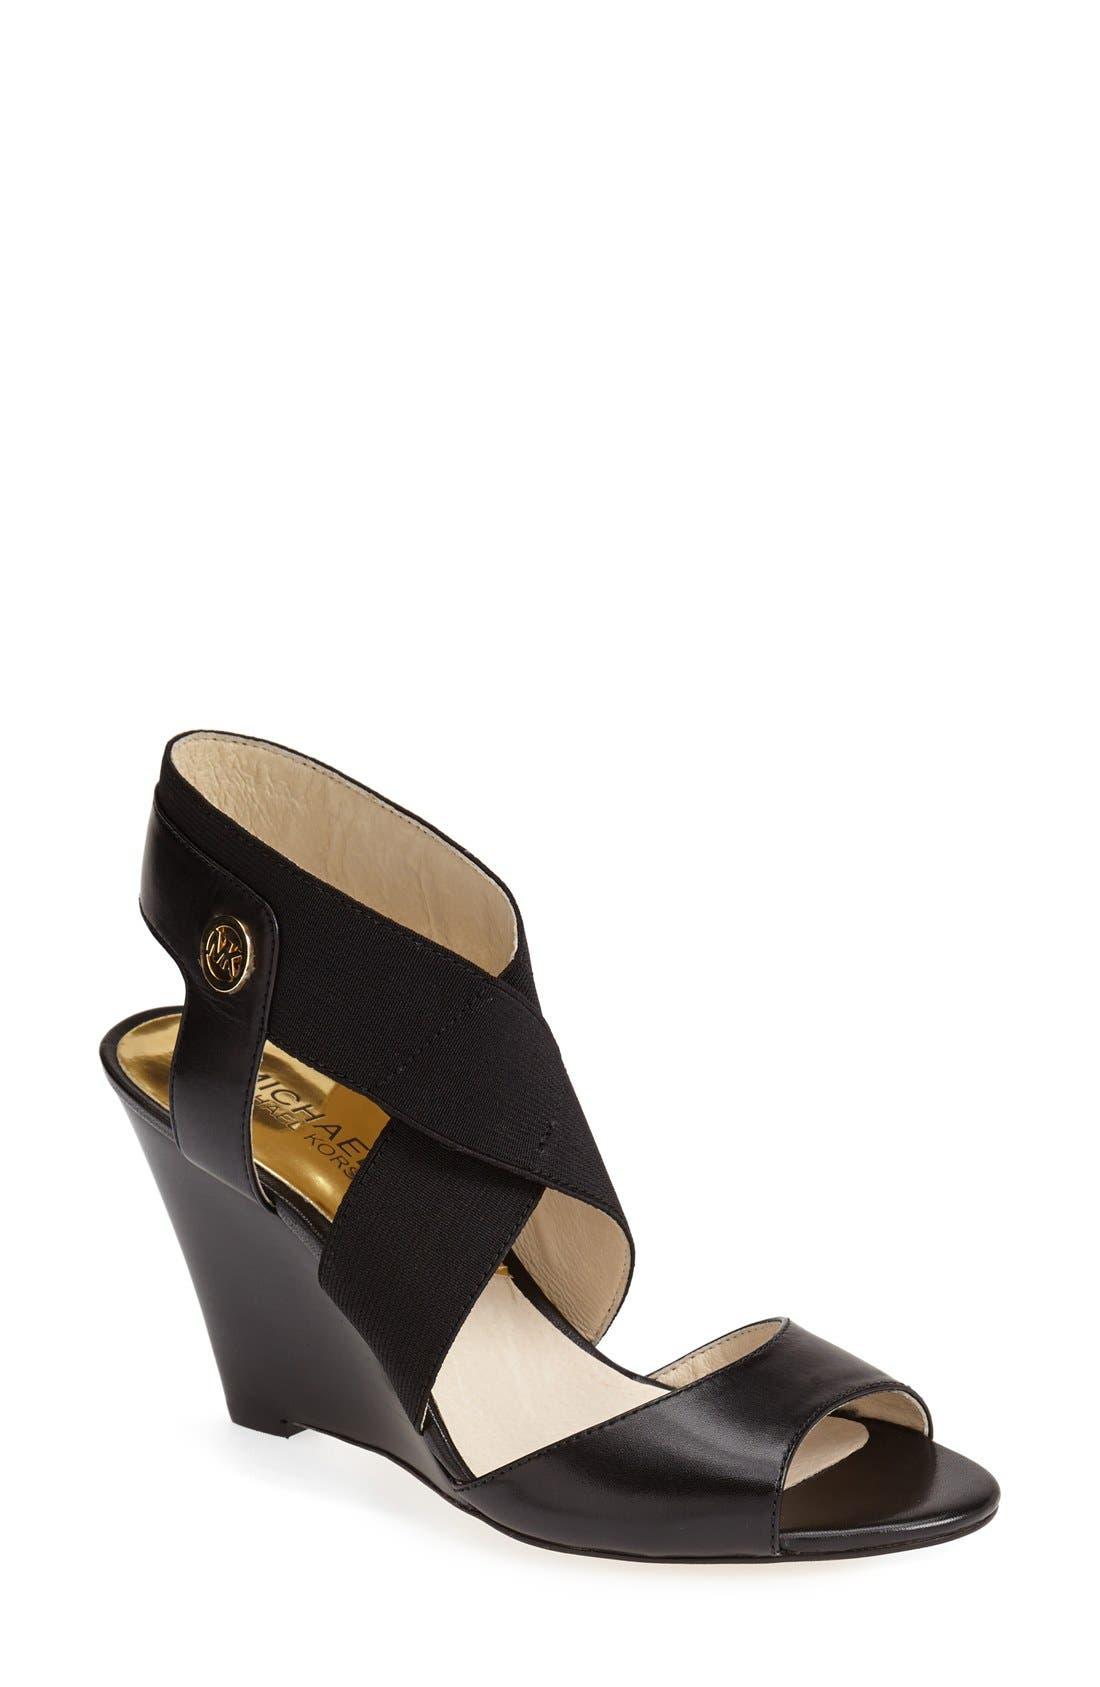 Main Image - MICHAEL Michael Kors 'Meadow' Wedge Sandal (Women)